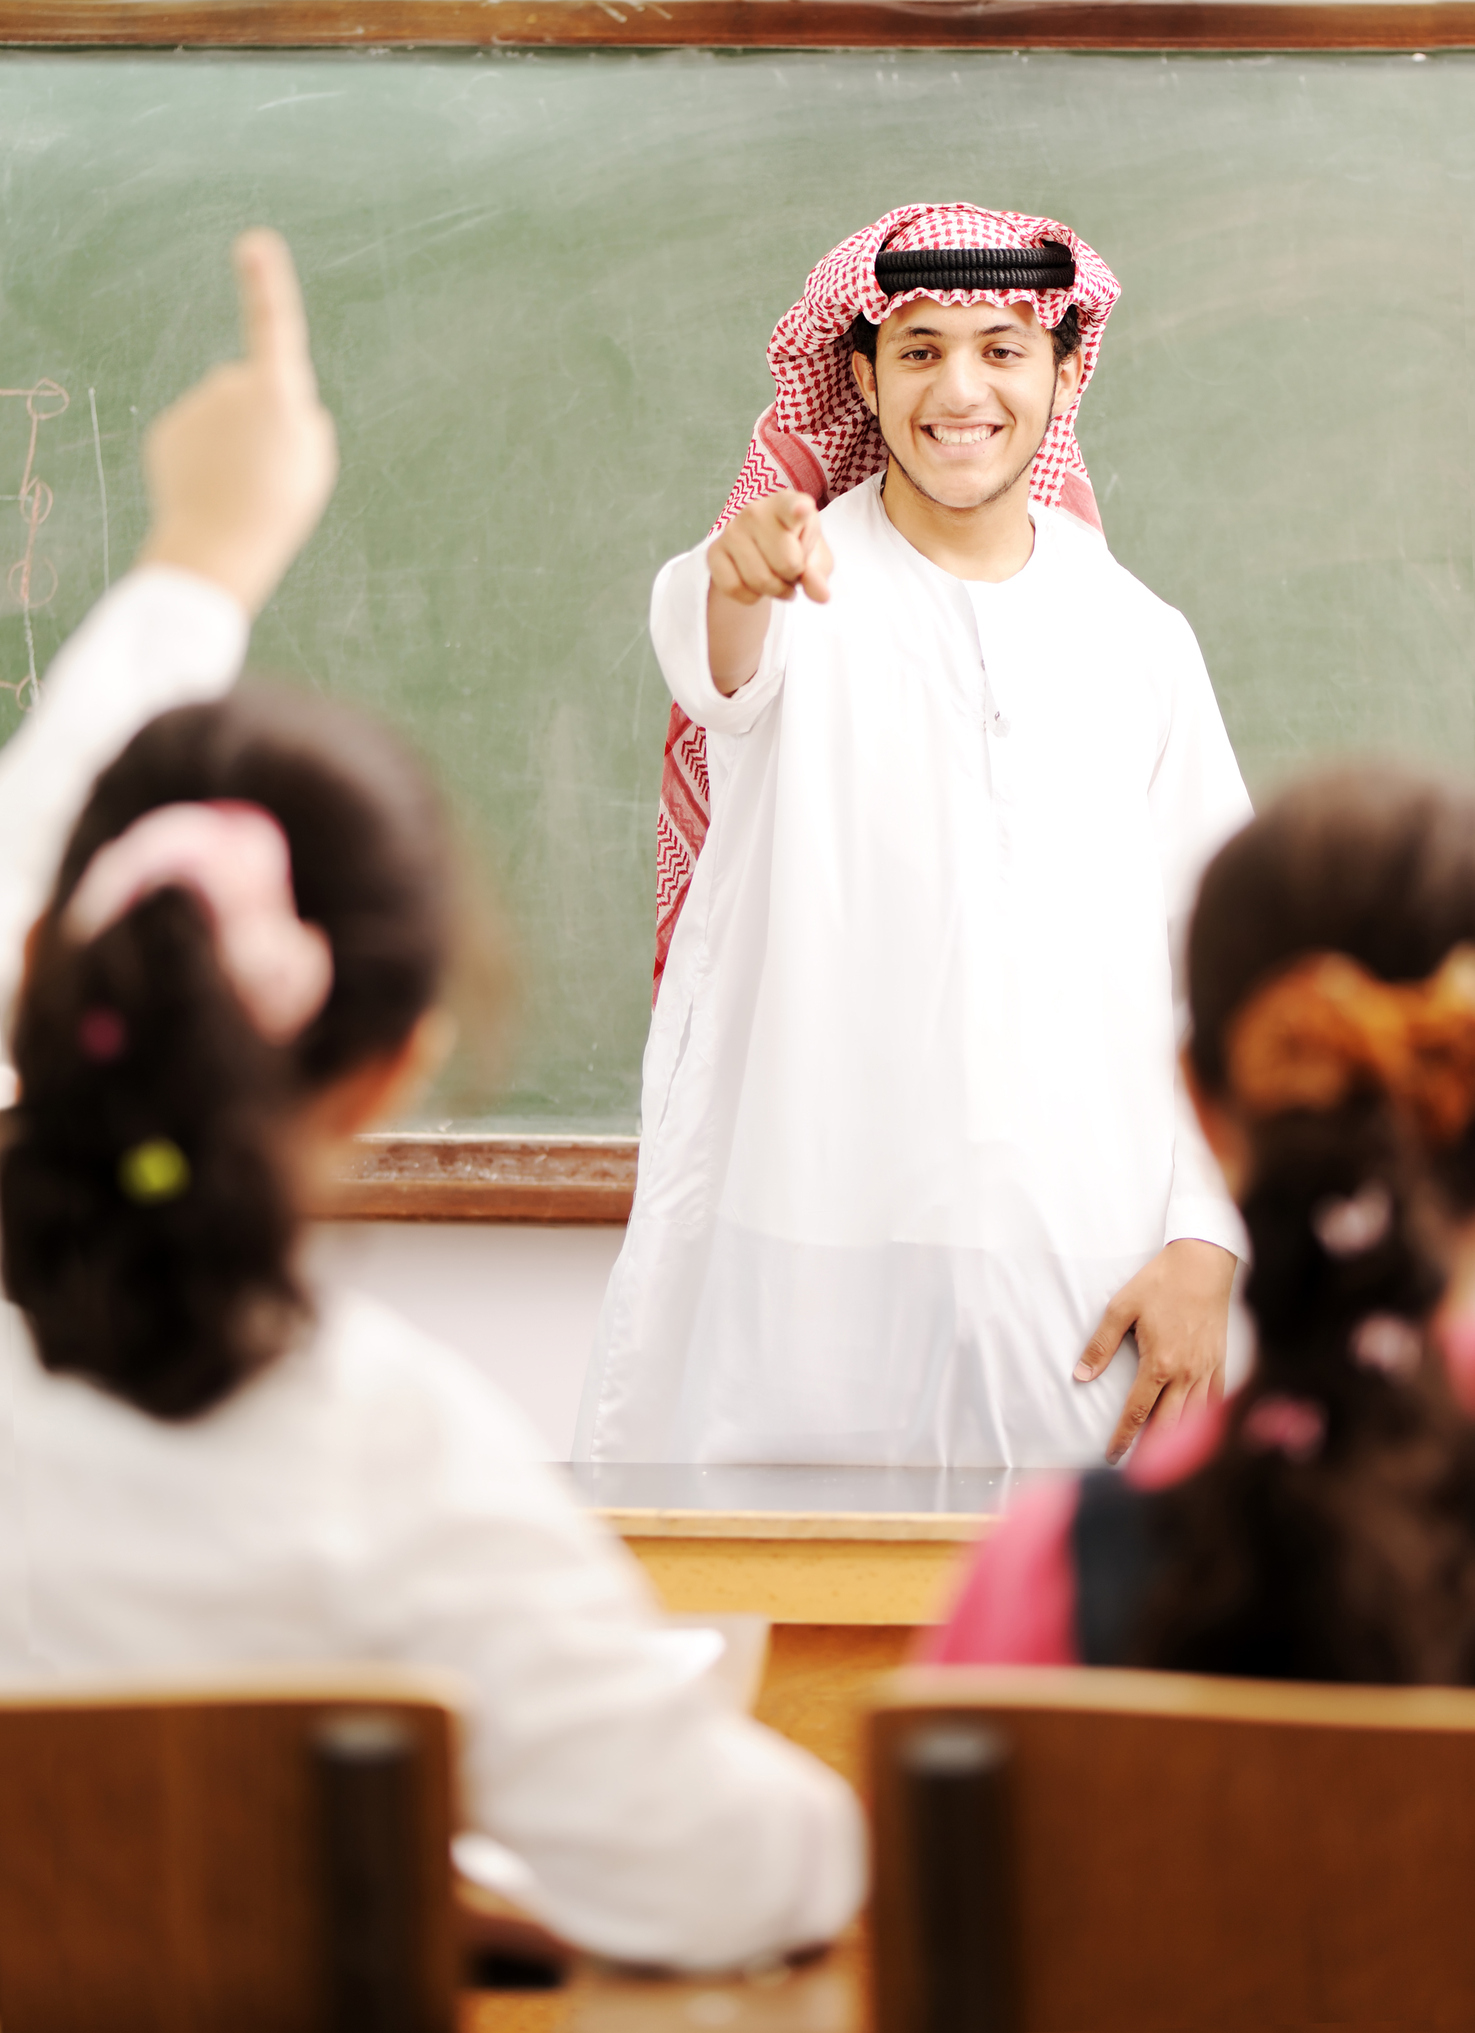 Saudi Innovation Club Builds Youth STEM Capabilities